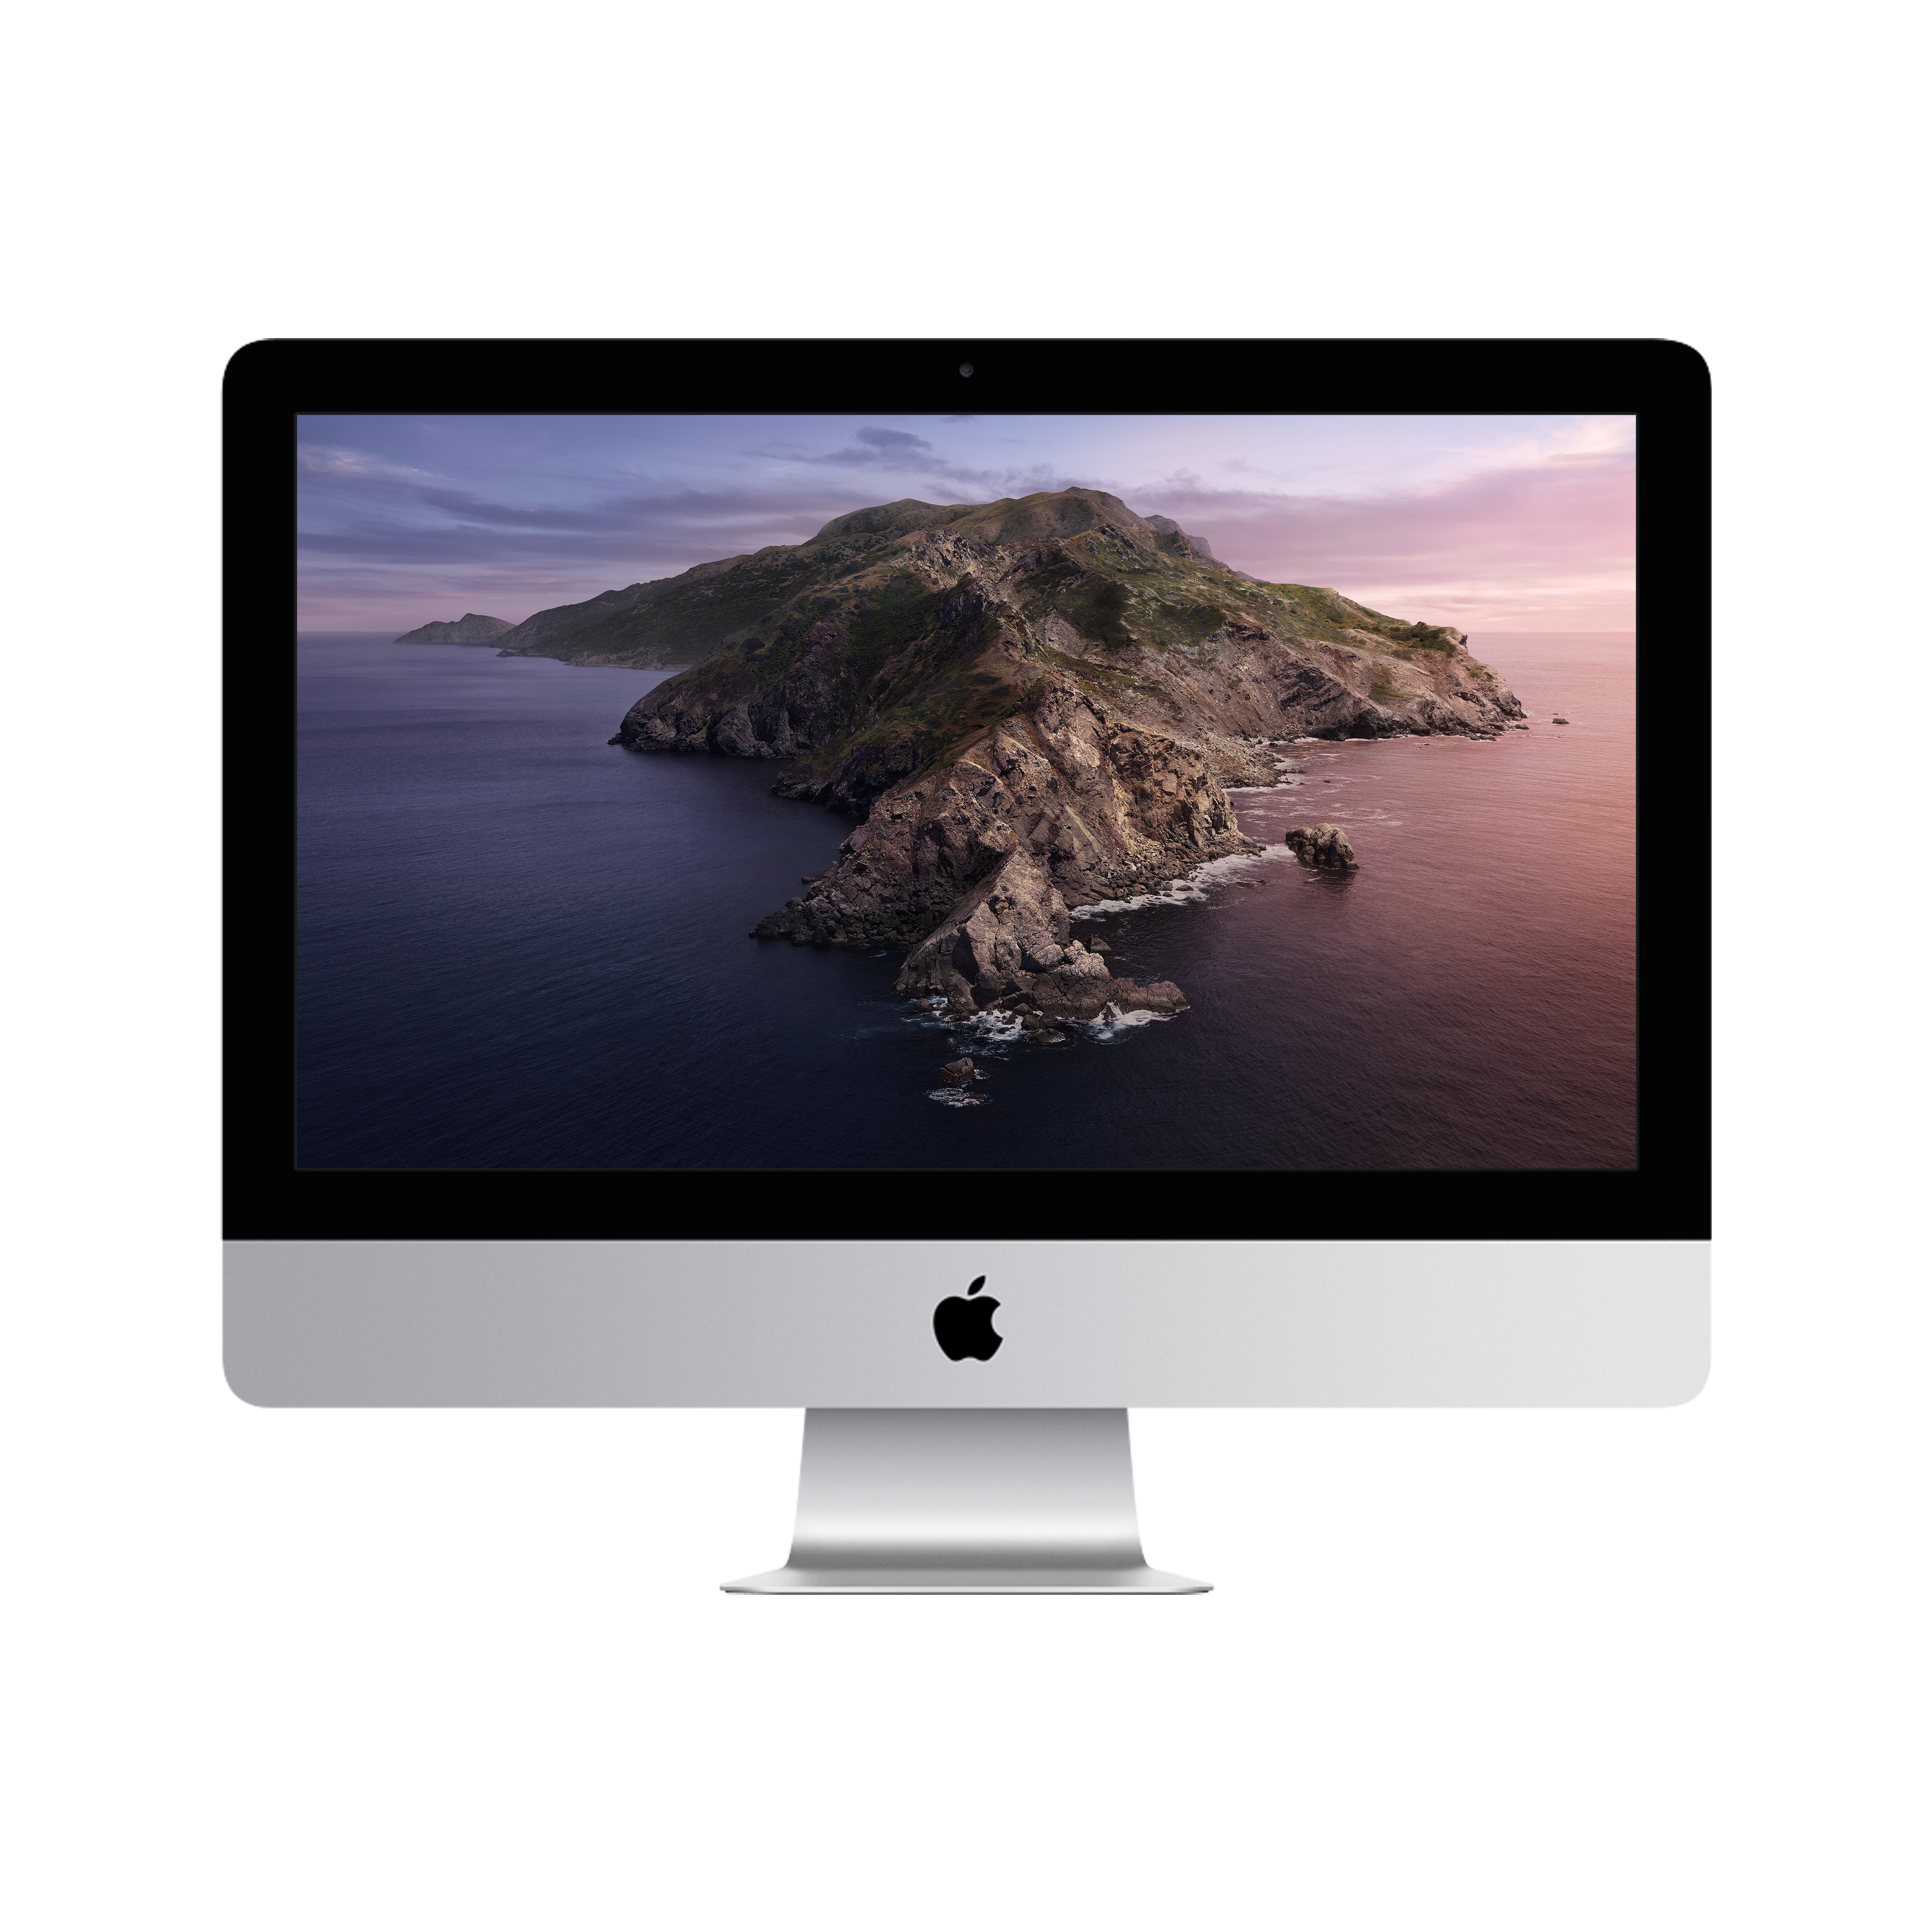 Apple 2020년 아이맥 21.5, 7세대 i5, 16GB, SSD 256GB